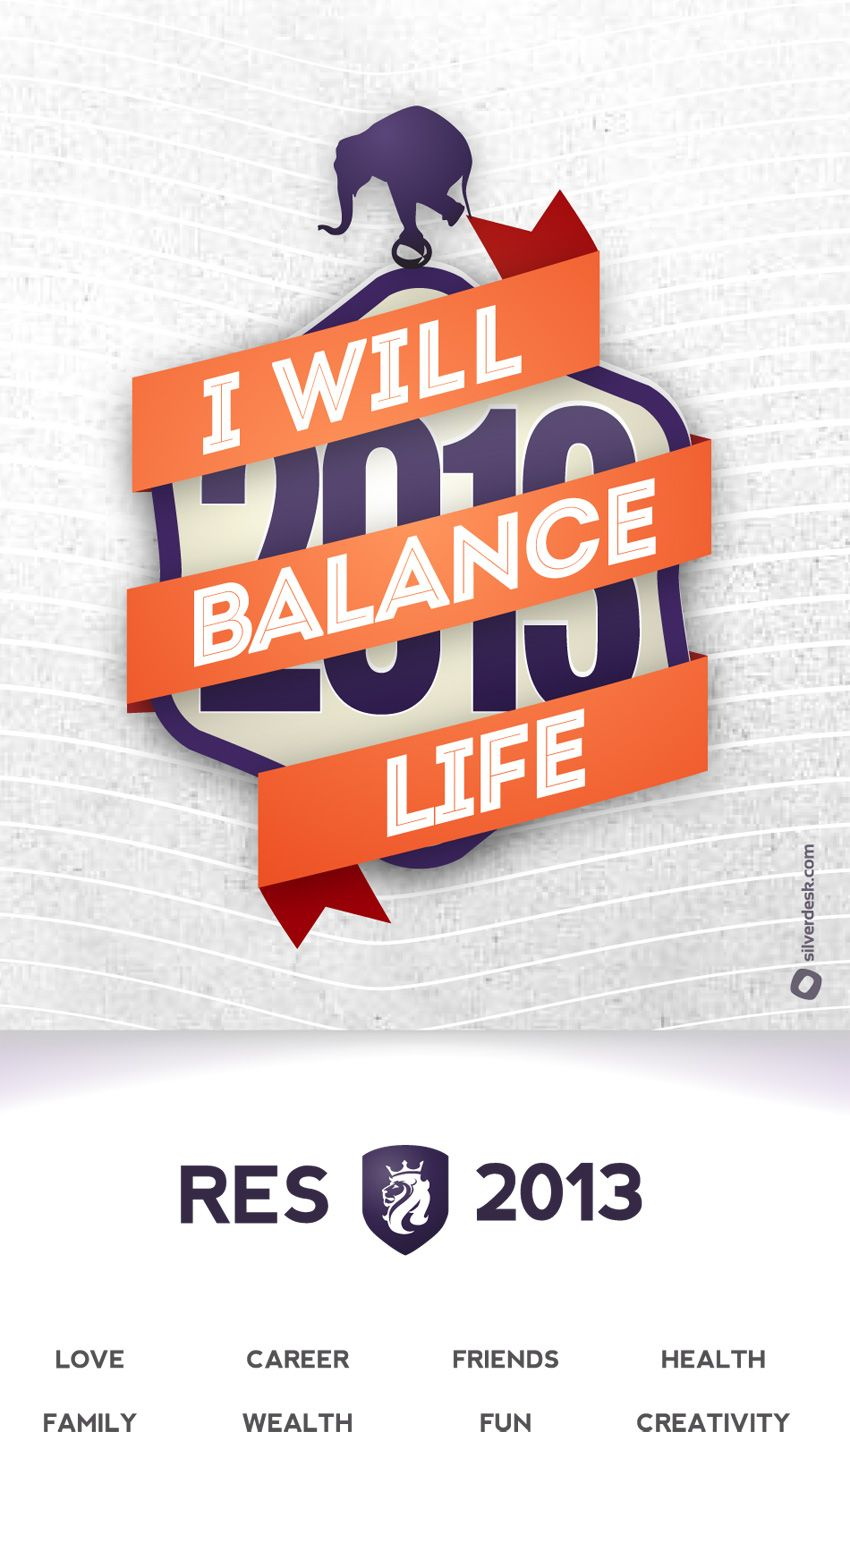 2013 Resolutions @silverdesk